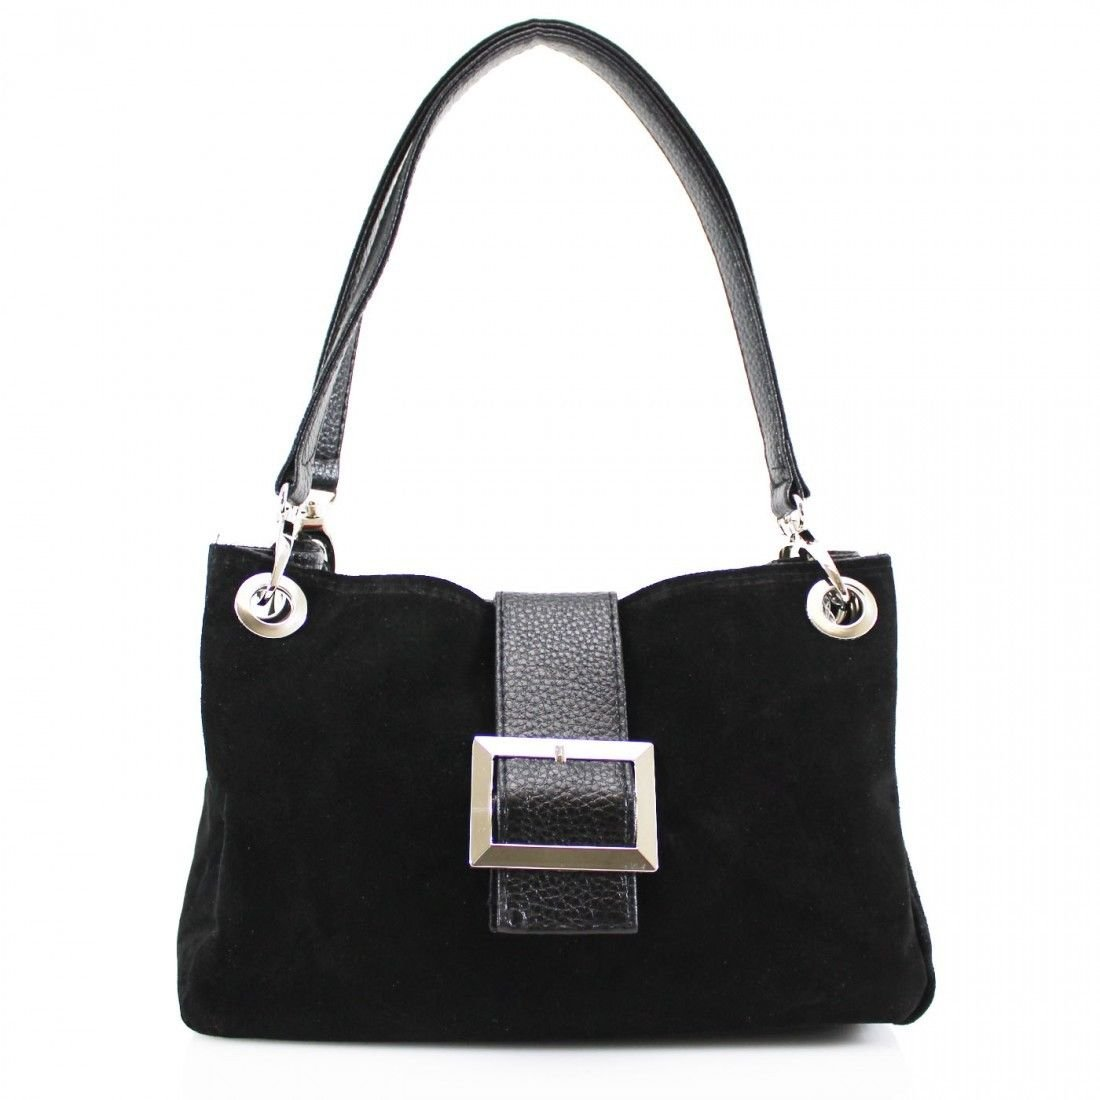 d6671b7946b2 New Ladies Real Italian Suede Leather Buckle Women Shoulder Clutch Tote  Hand Bag (Black)  Handbags  Amazon.com